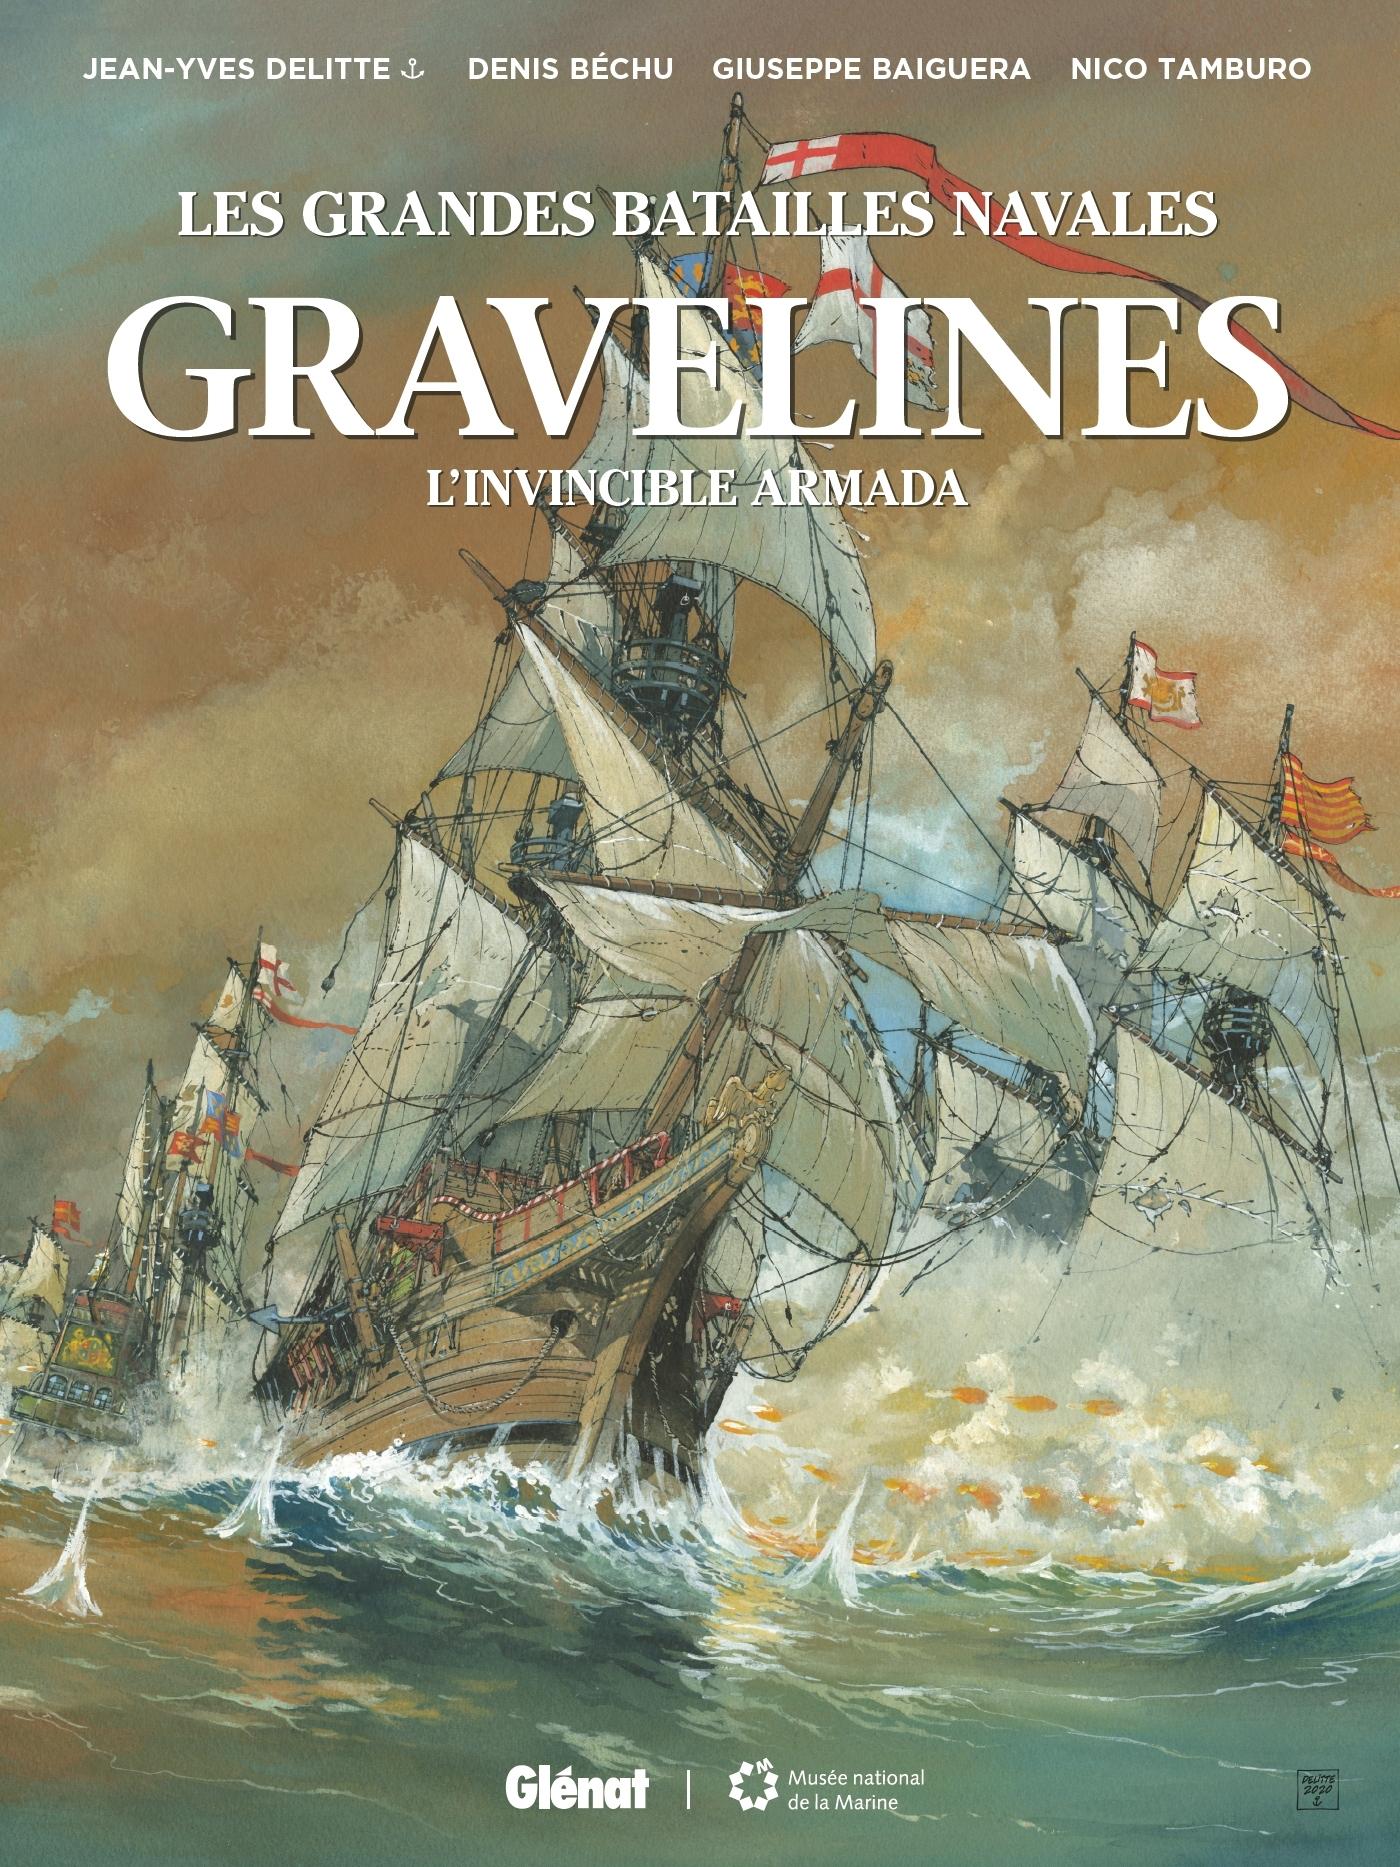 LES GRANDES BATAILLES NAVALES - GRAVELINES - L'INVINCIBLE ARMADA